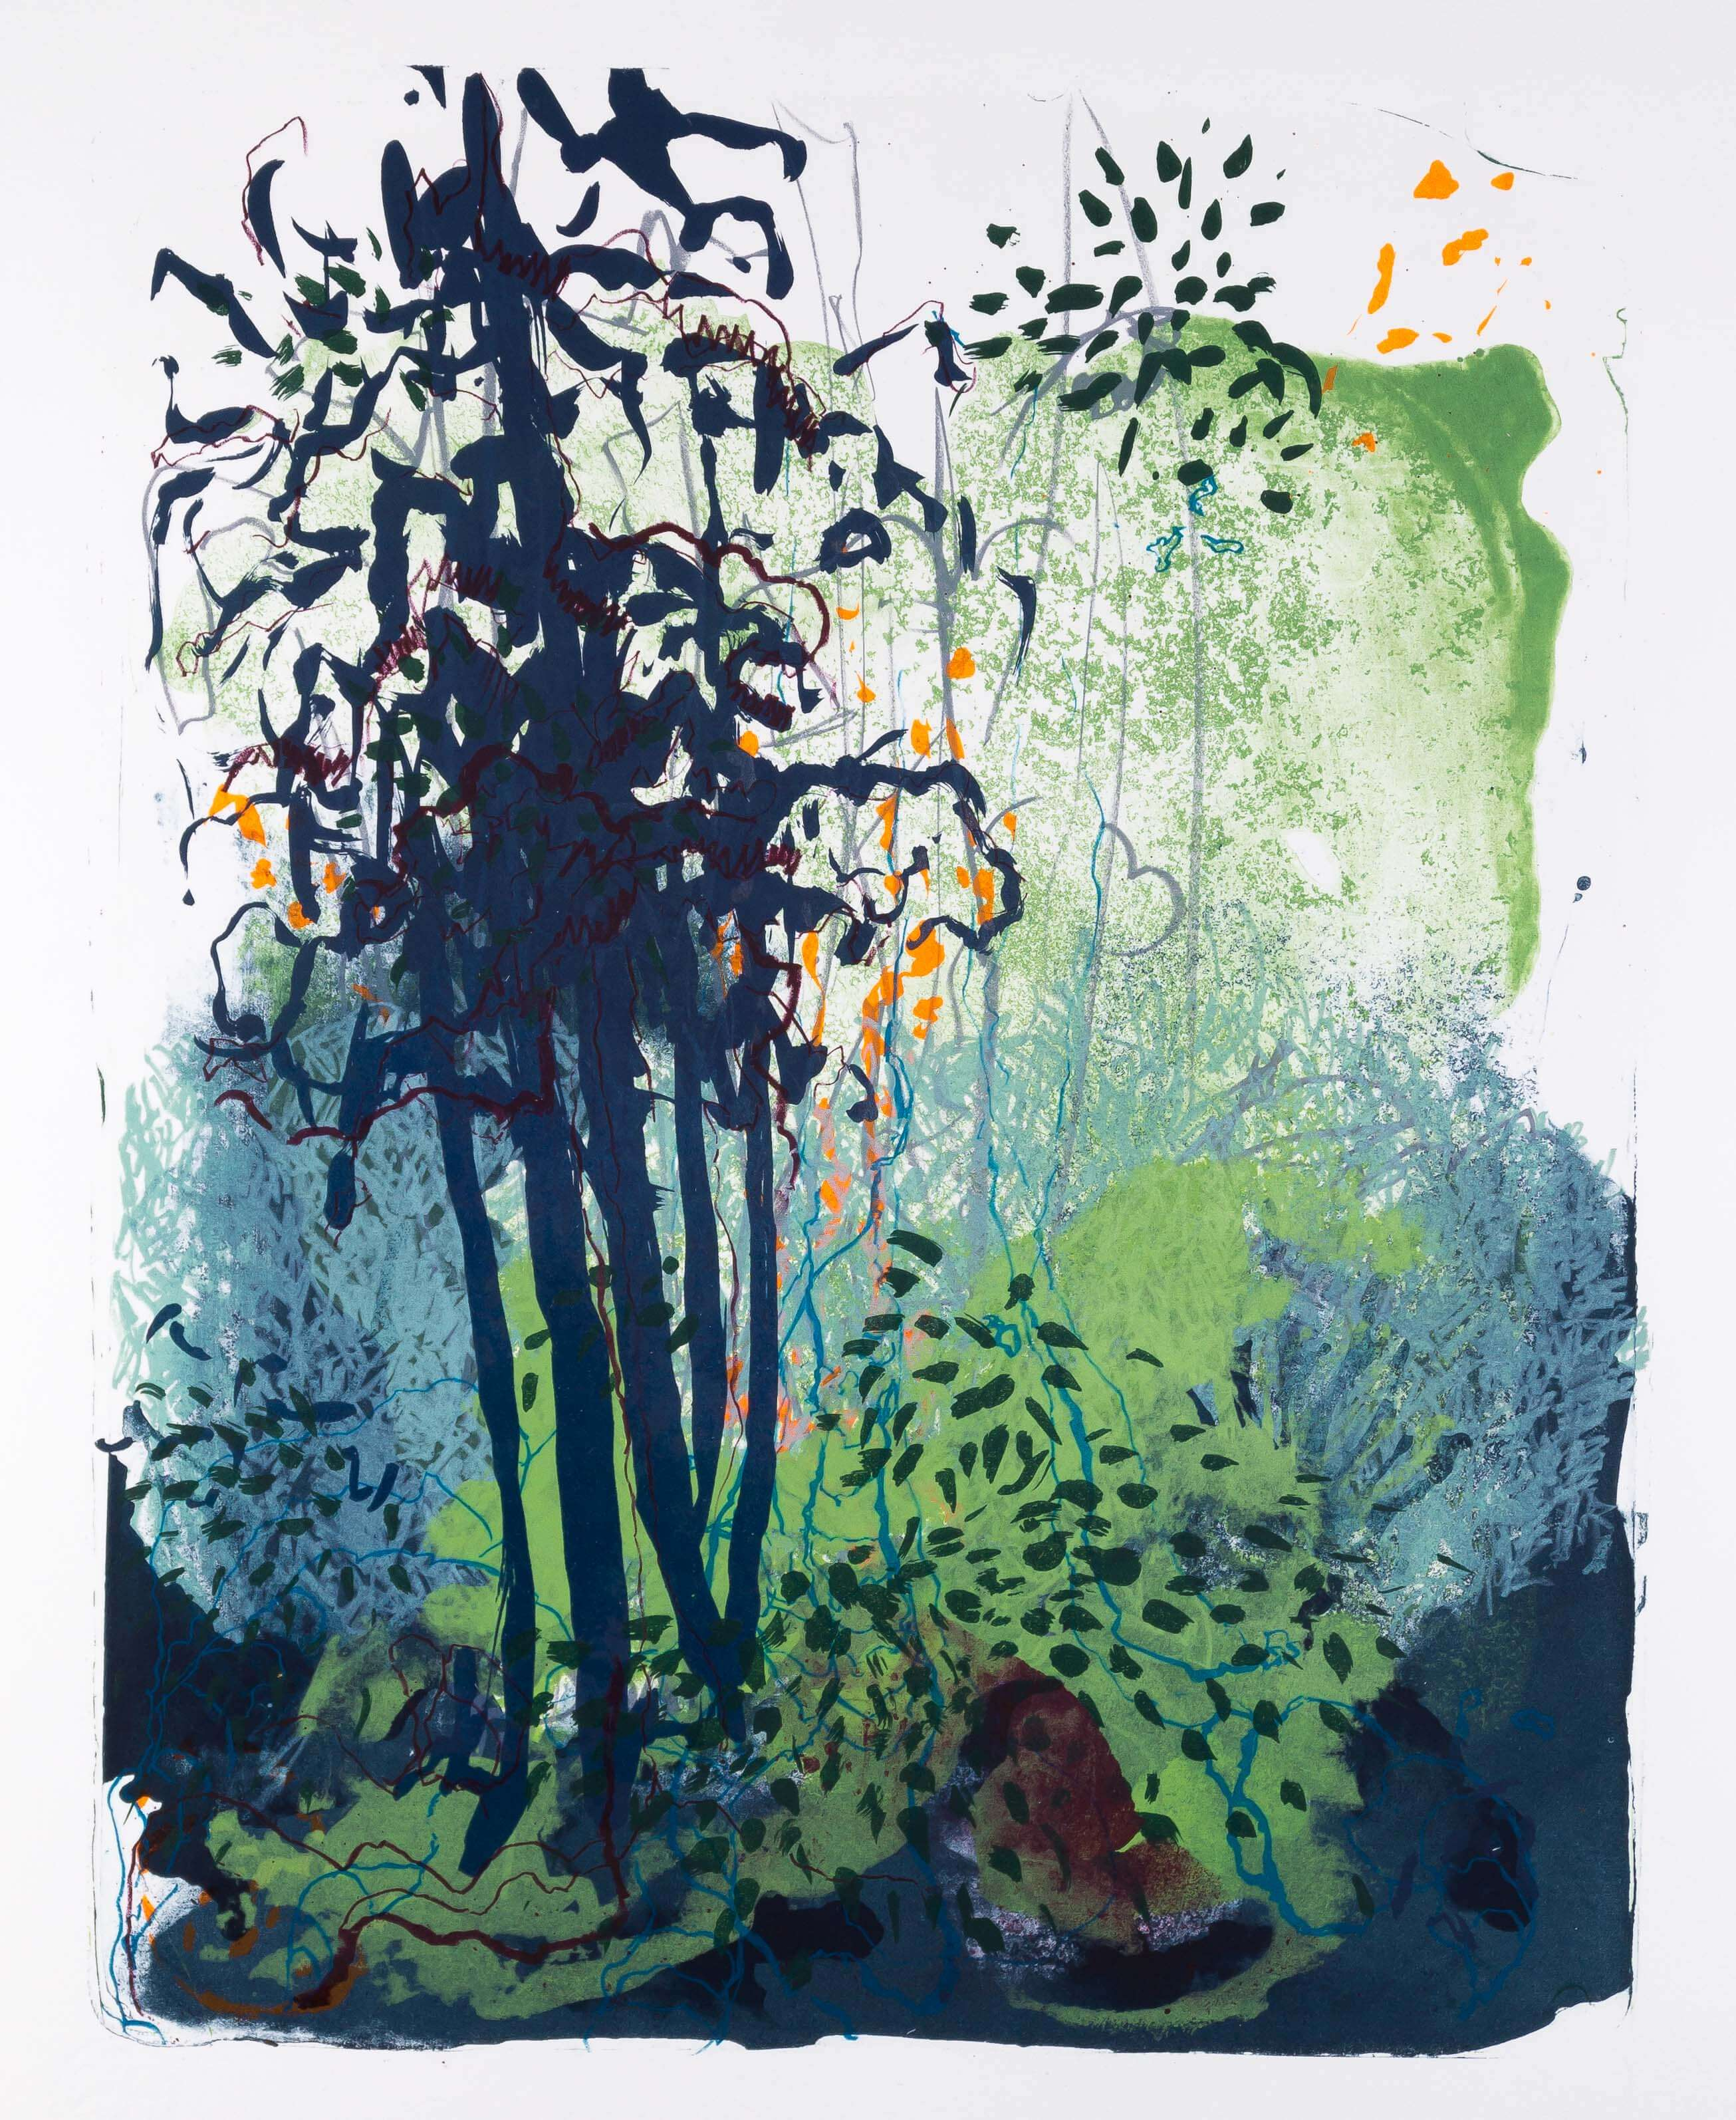 Katharina Albers. Wald X(F)-IX, 2017, Farb-Lithographie, Unikat, 50x40 cm